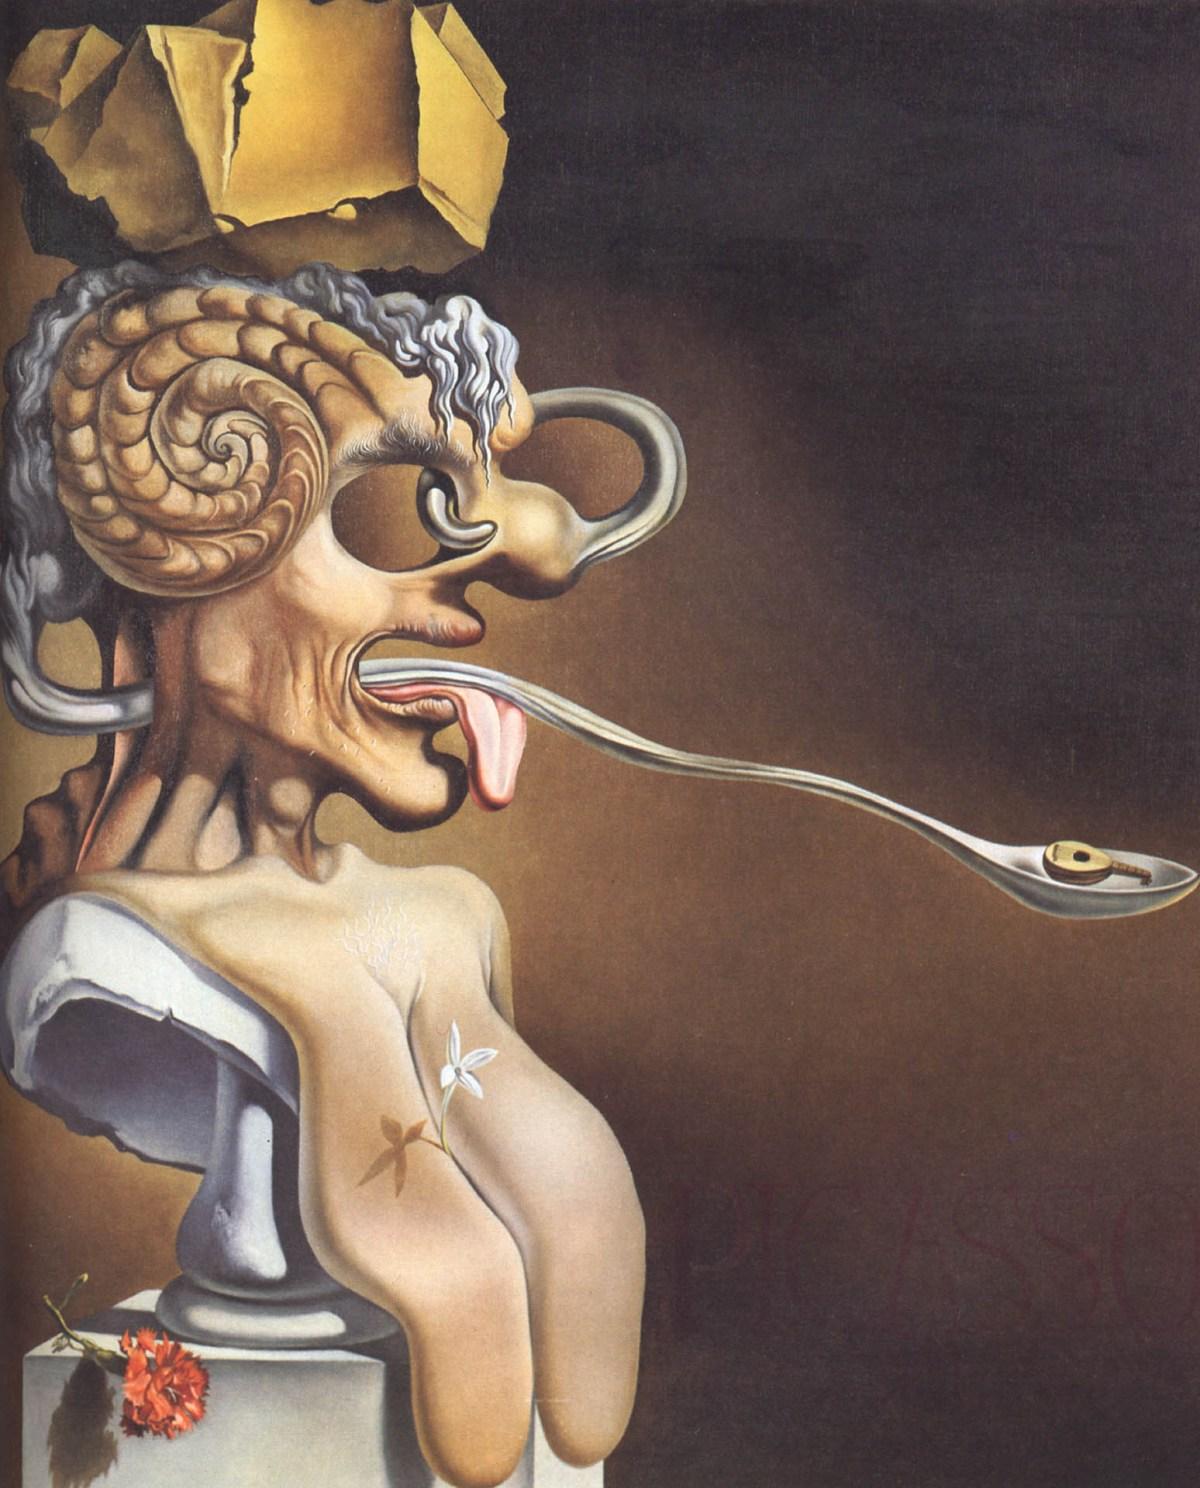 Portrait of Picasso by Salvador Dali